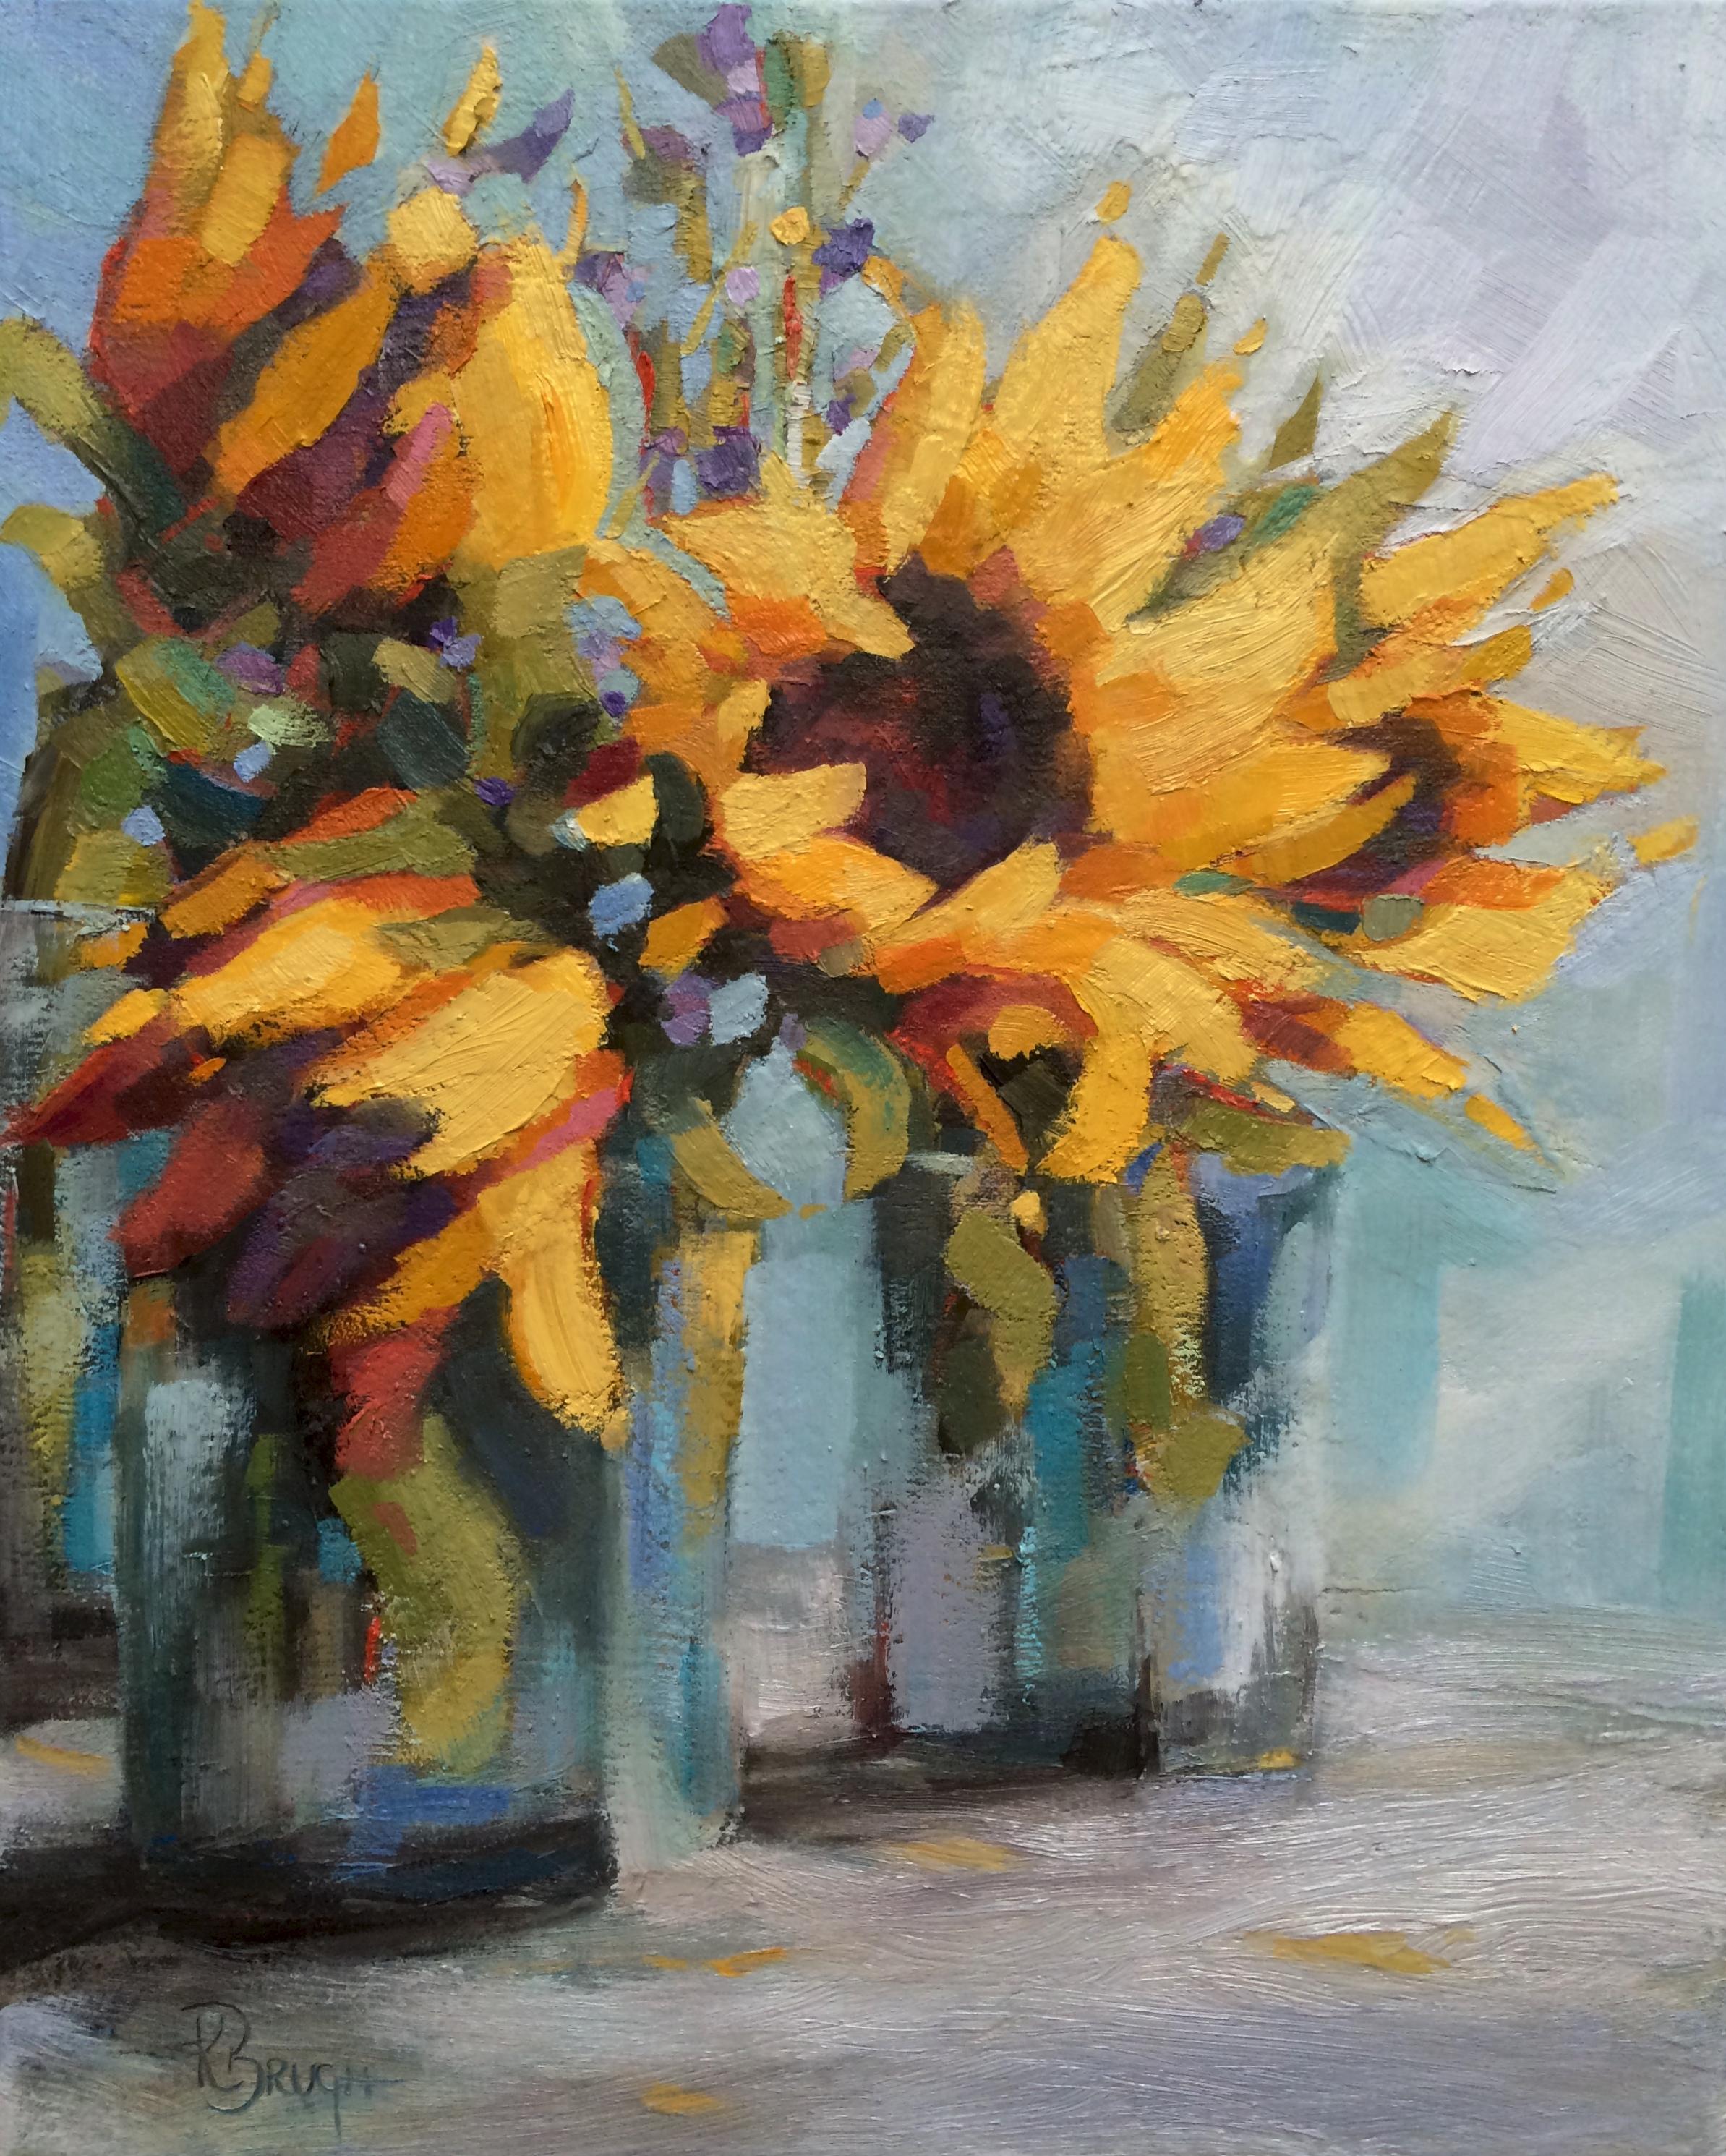 Kelley Brugh_Morning Sunshine_16x20, Oil on canvas.jpg